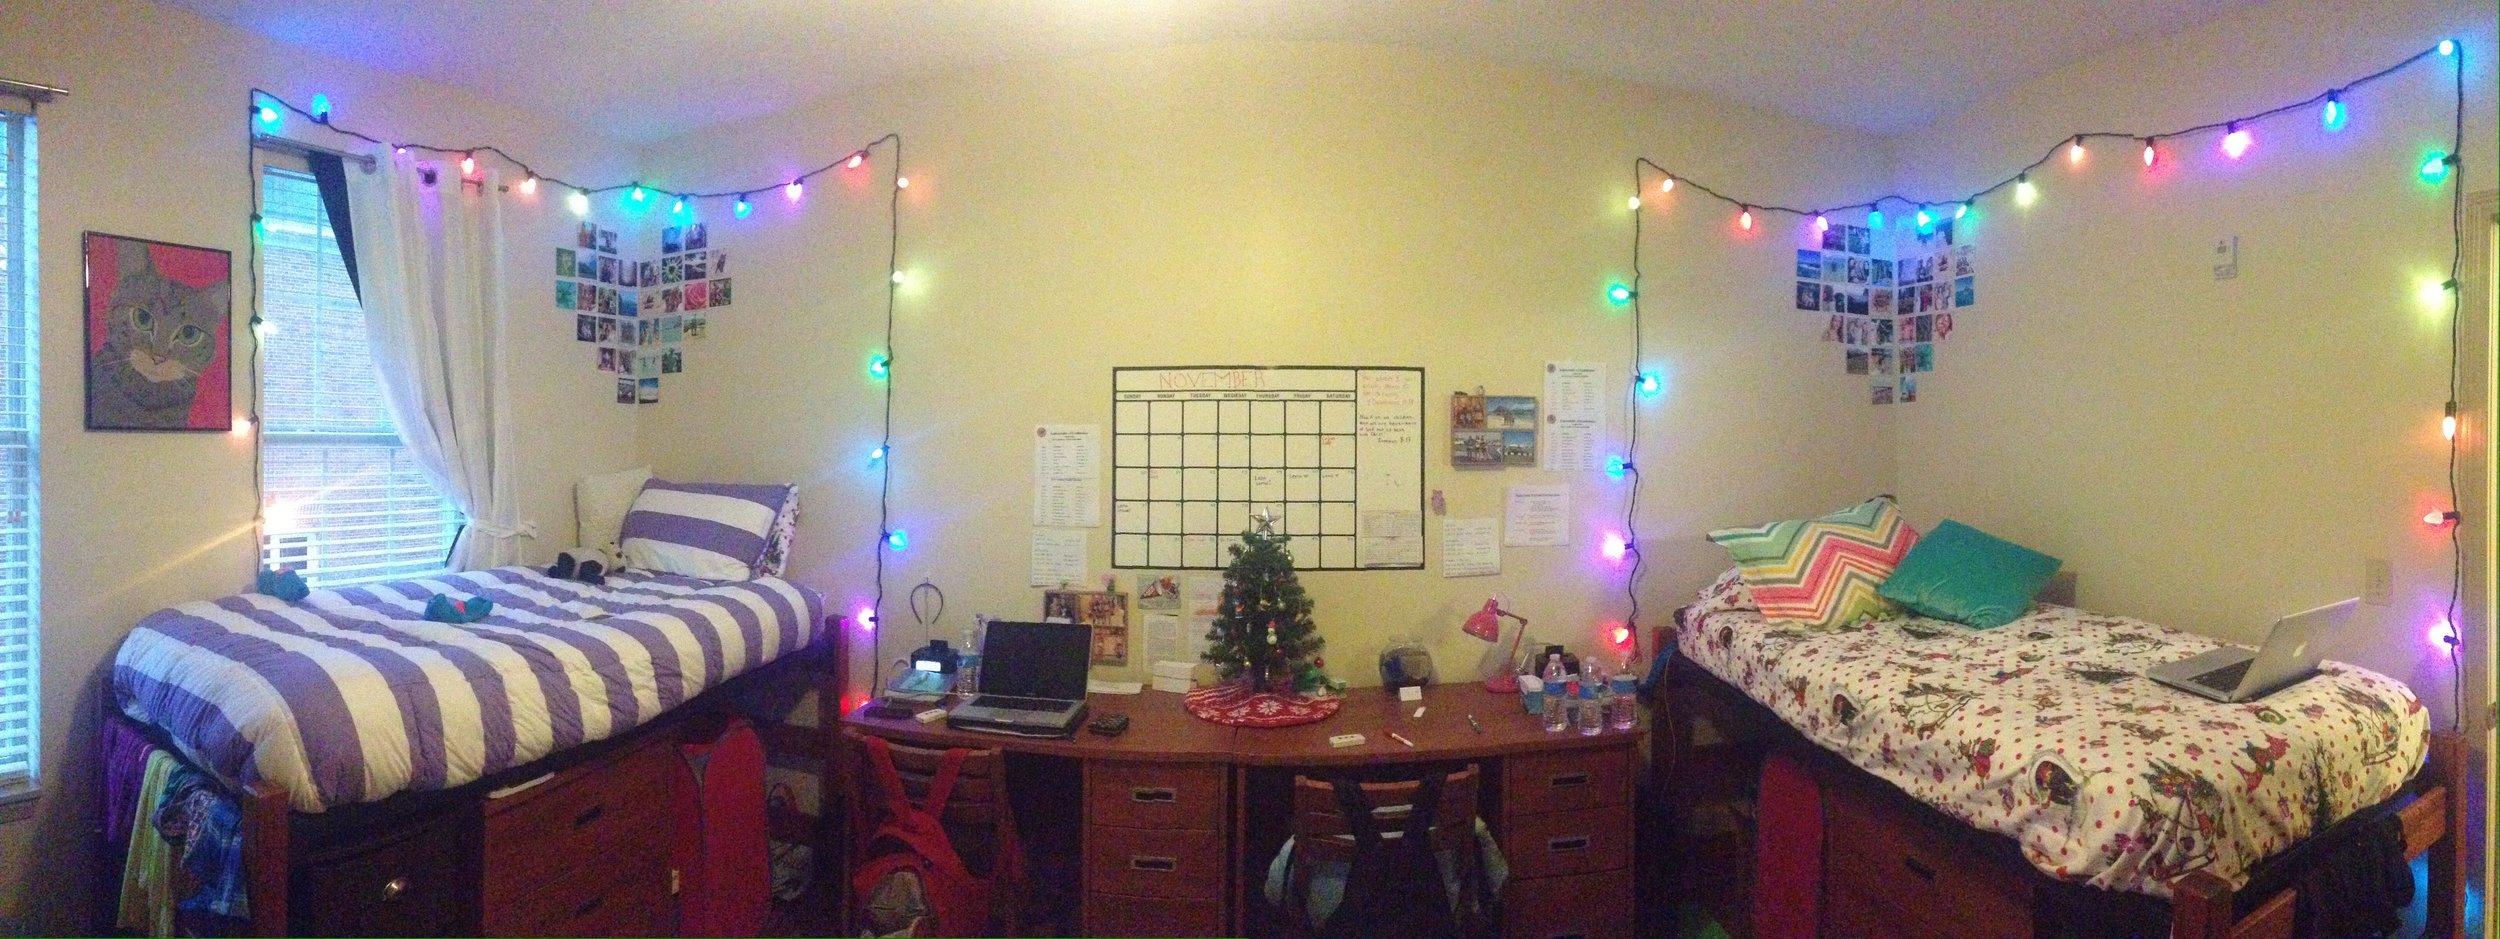 Our freshmen year dorm room